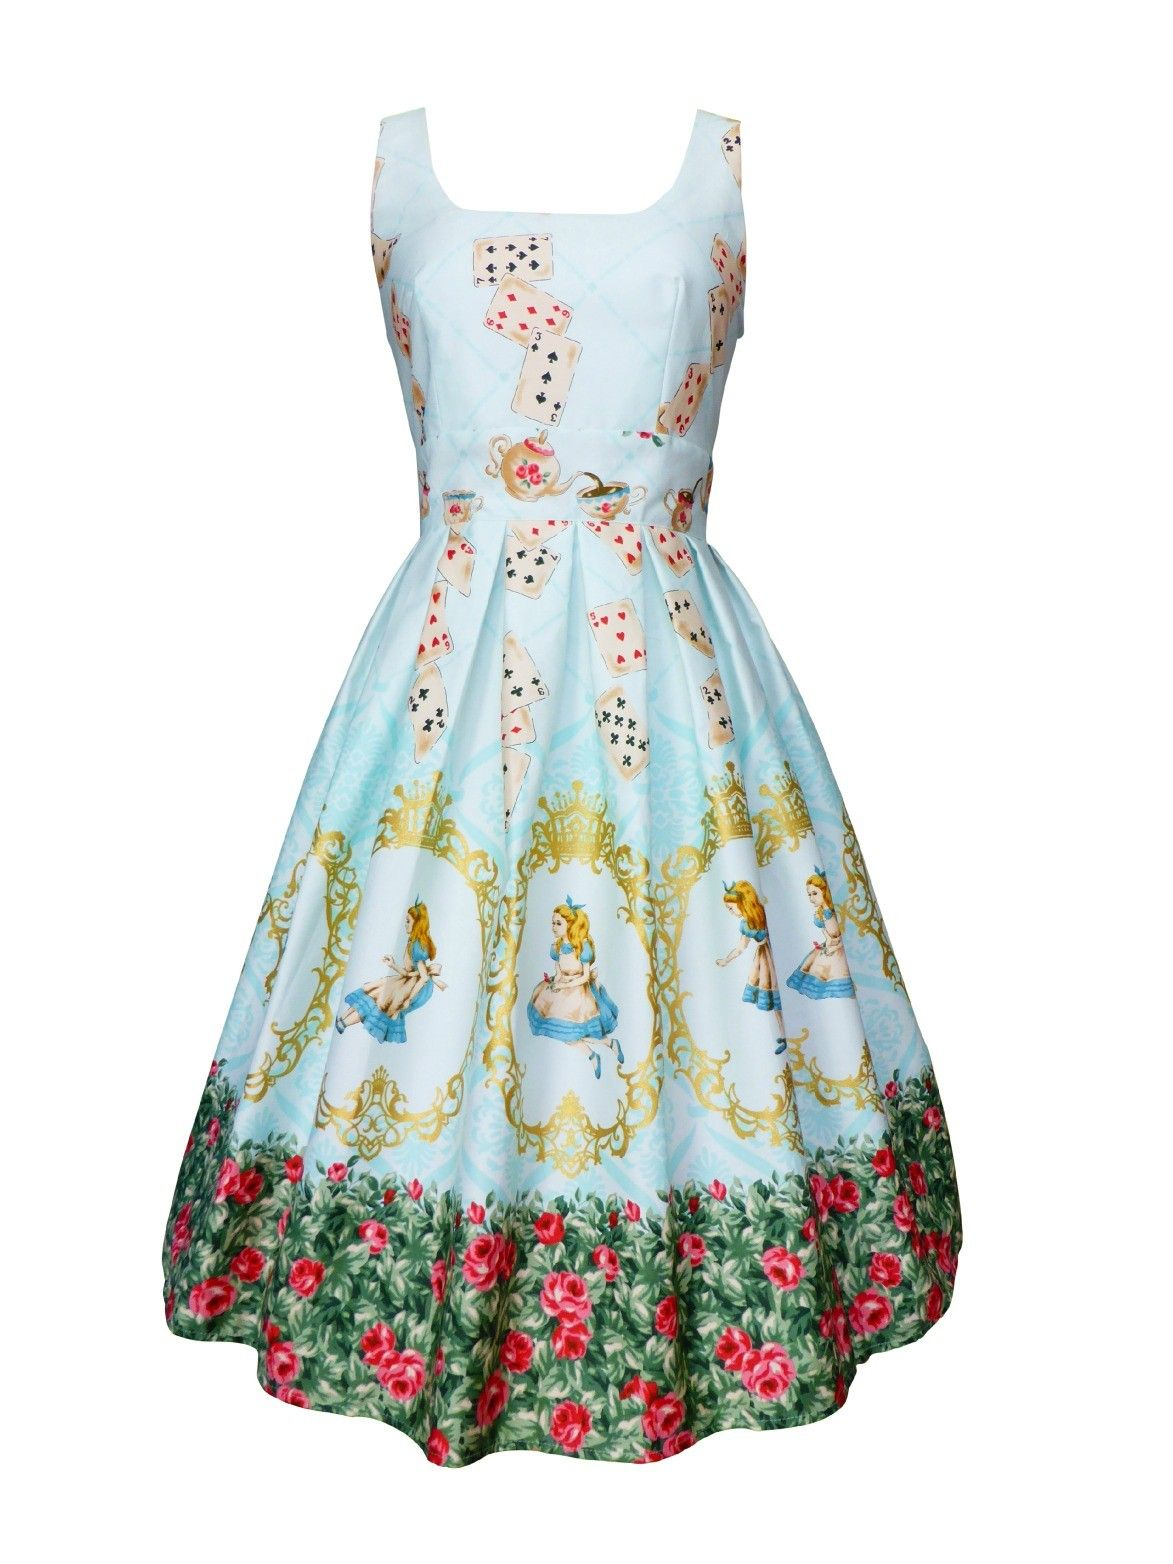 68b8383ee307 alice_dress.jpg Alice In Wonderland Outfit, Alice In Wonderland Vintage,  Alice In Wonderland